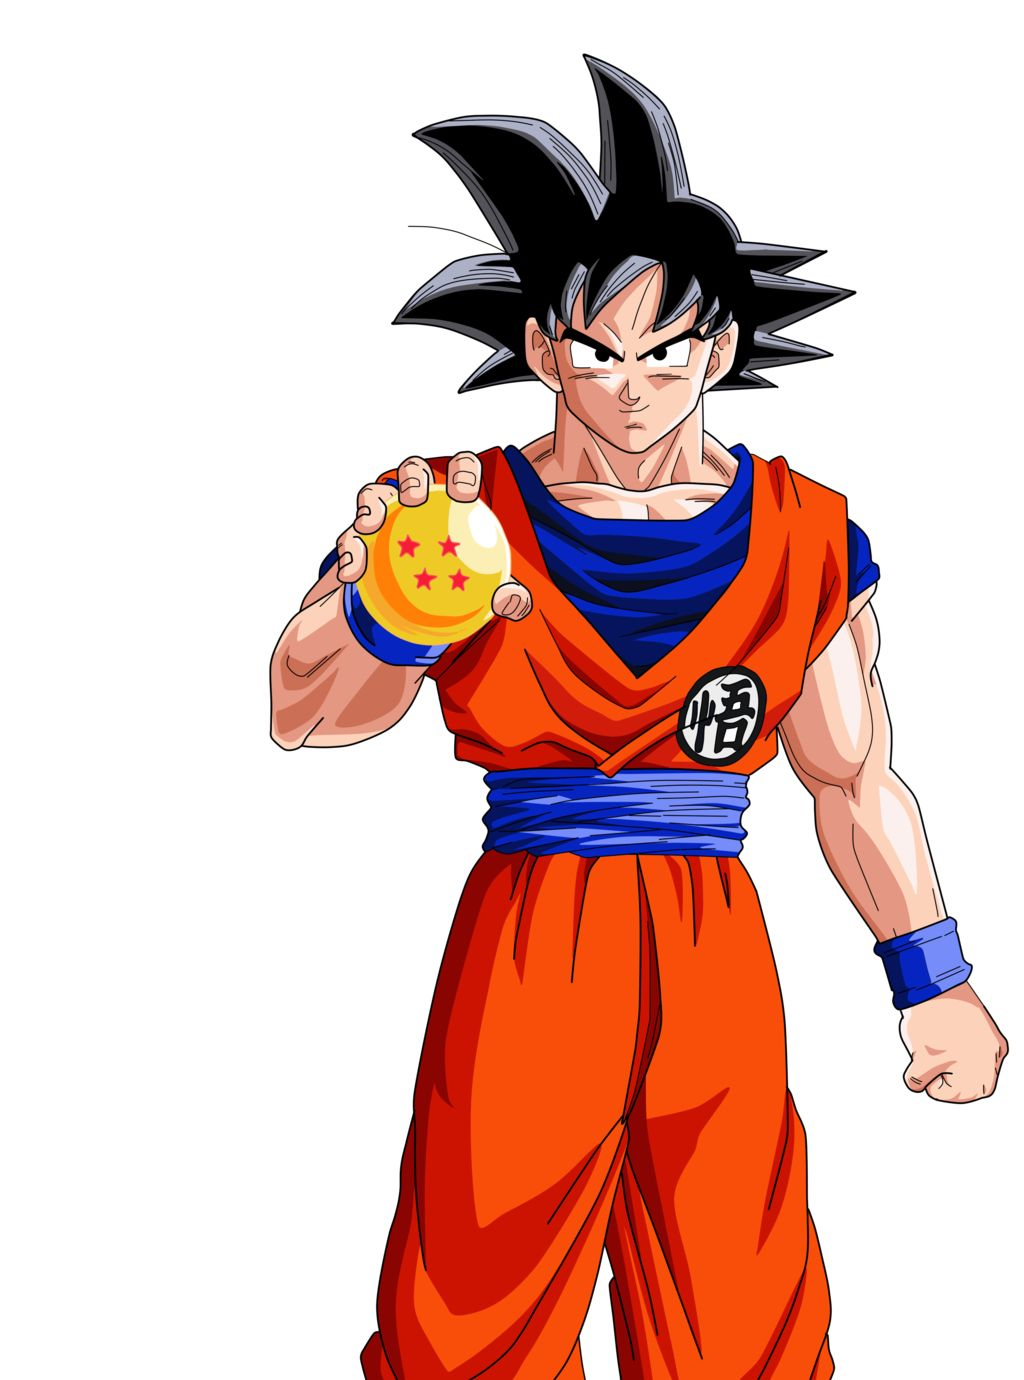 b7c1efba Goku holding the 4 Star Dragonball | Dragonball | Dragon ball ...